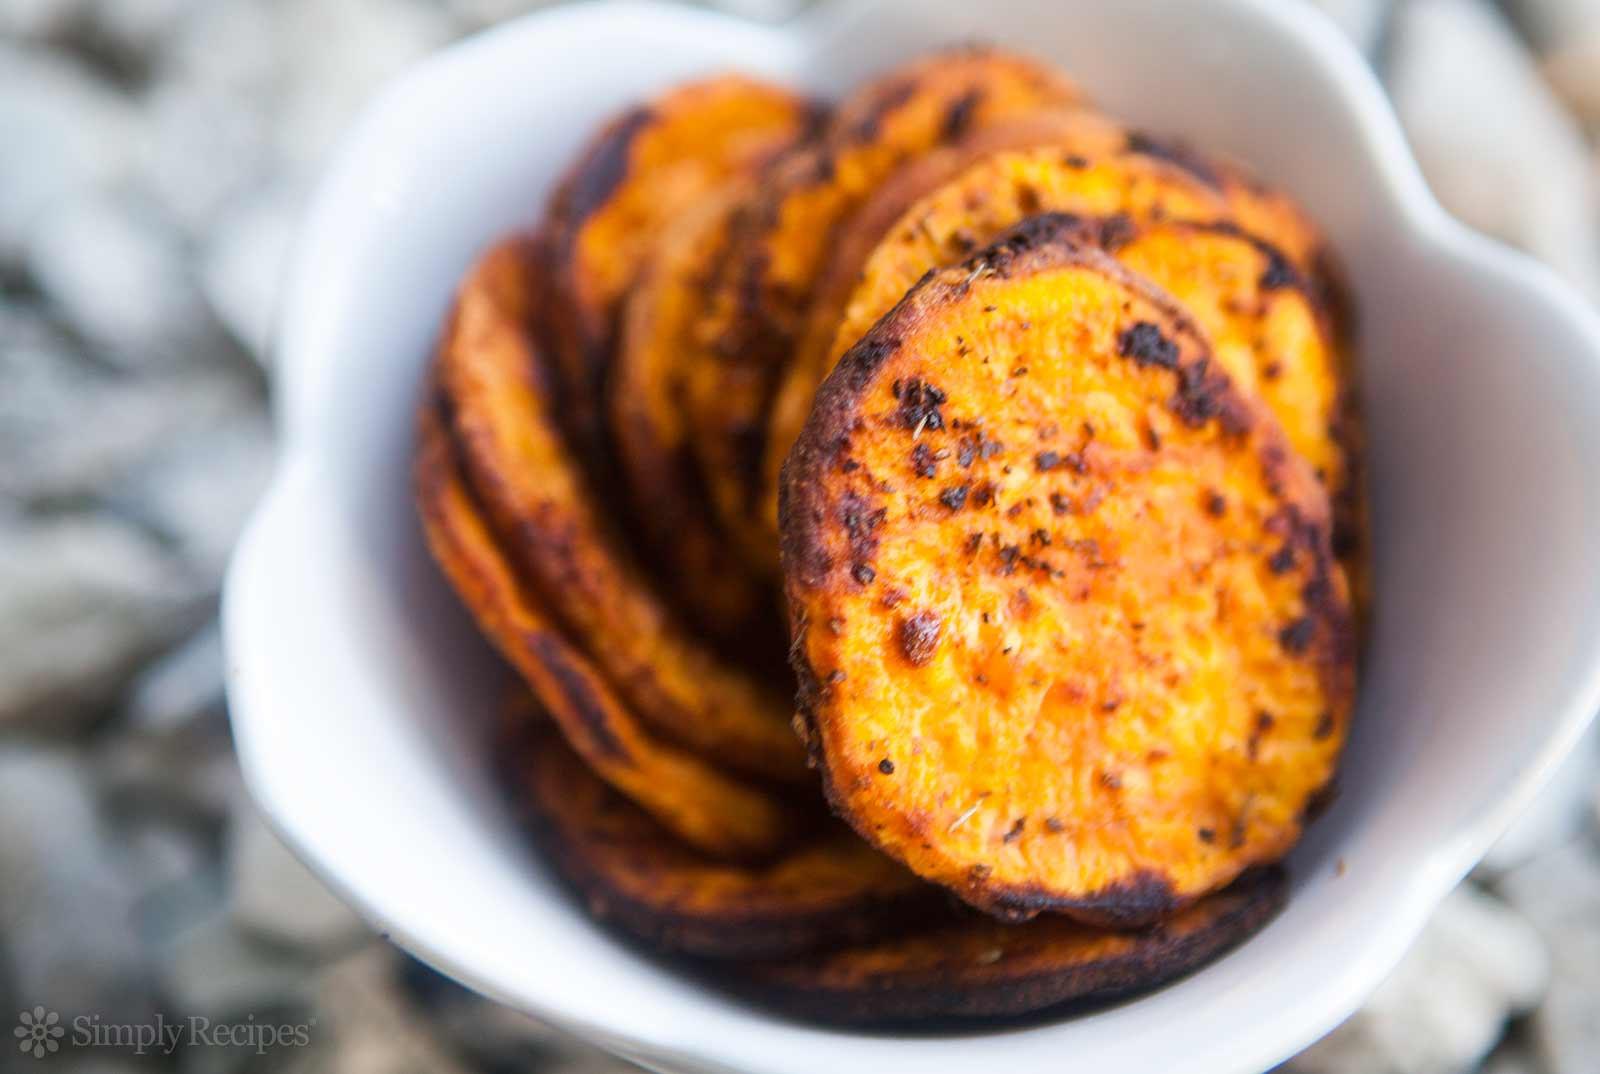 Sweet Potato Fry Recipe  Oven Baked Sweet Potato Fries Recipe